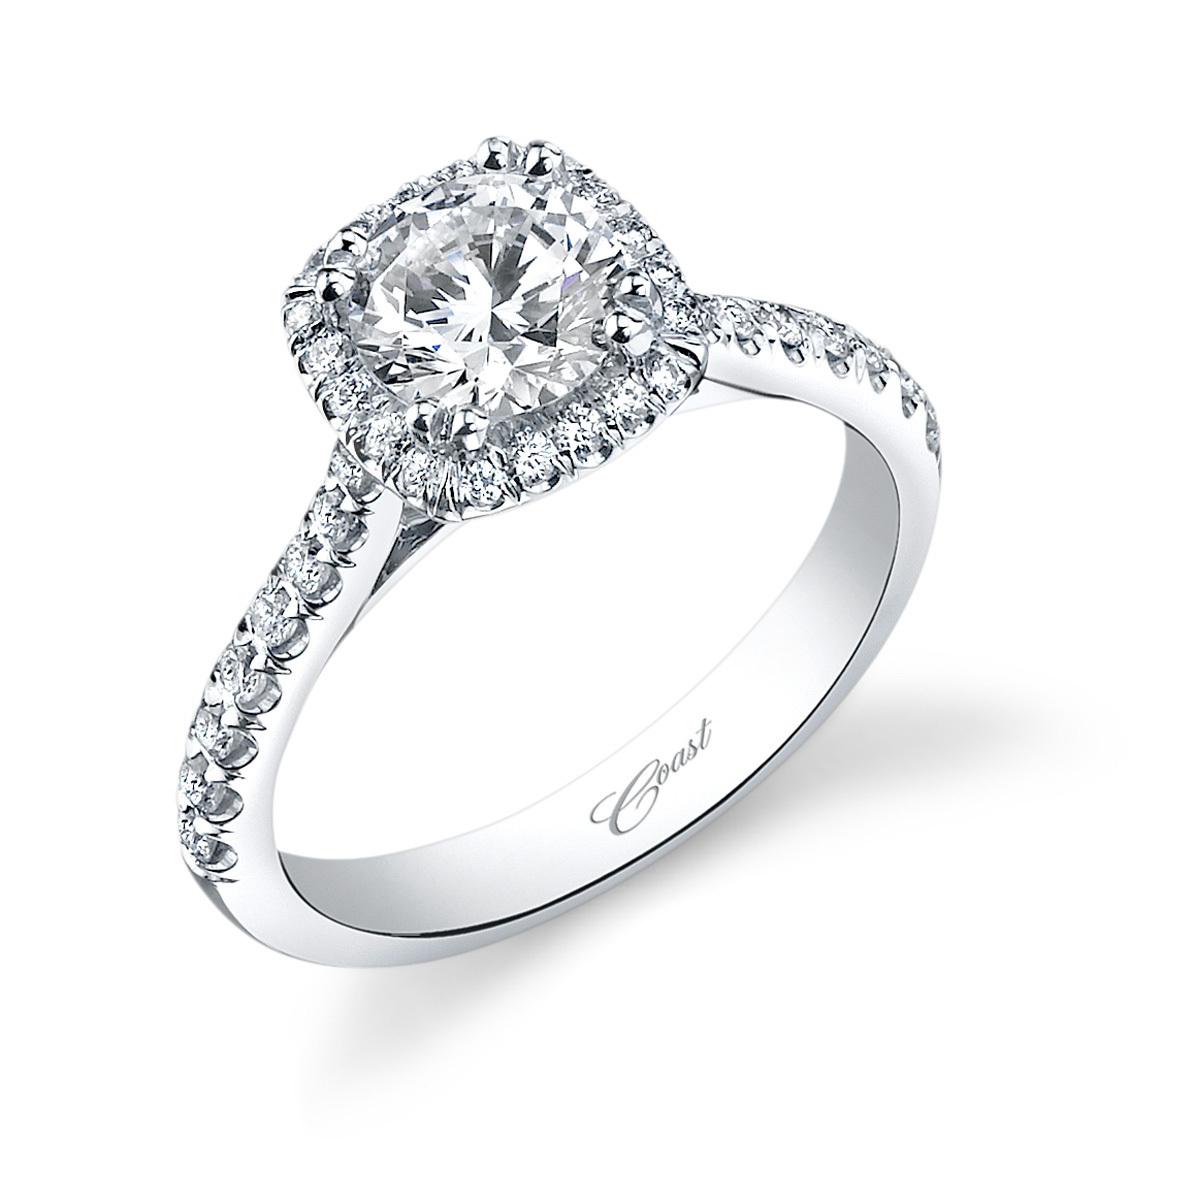 Charisma Engagement Ring - Beautiful Halo